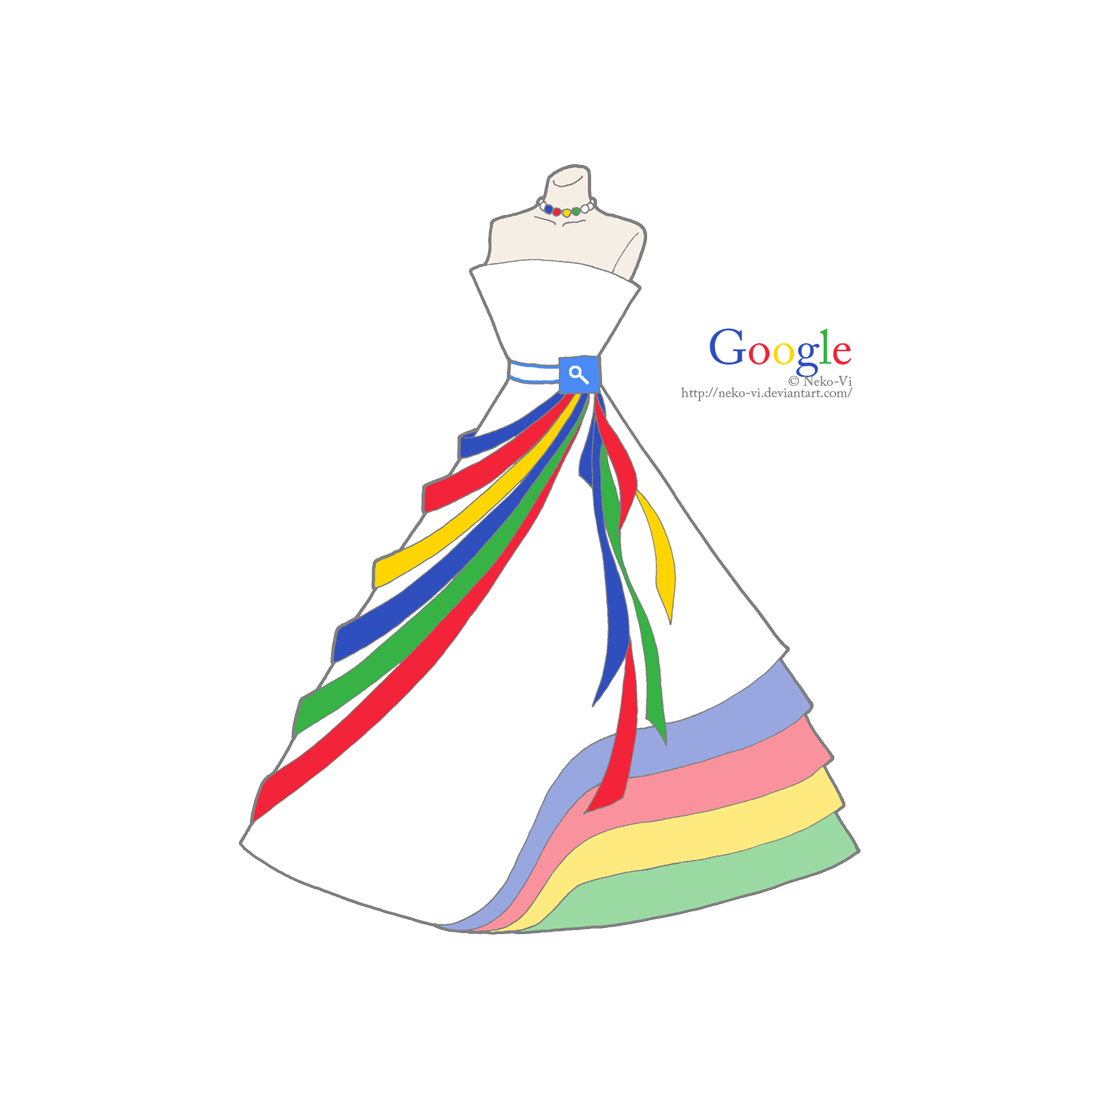 Google in Fashion by Neko-Vi